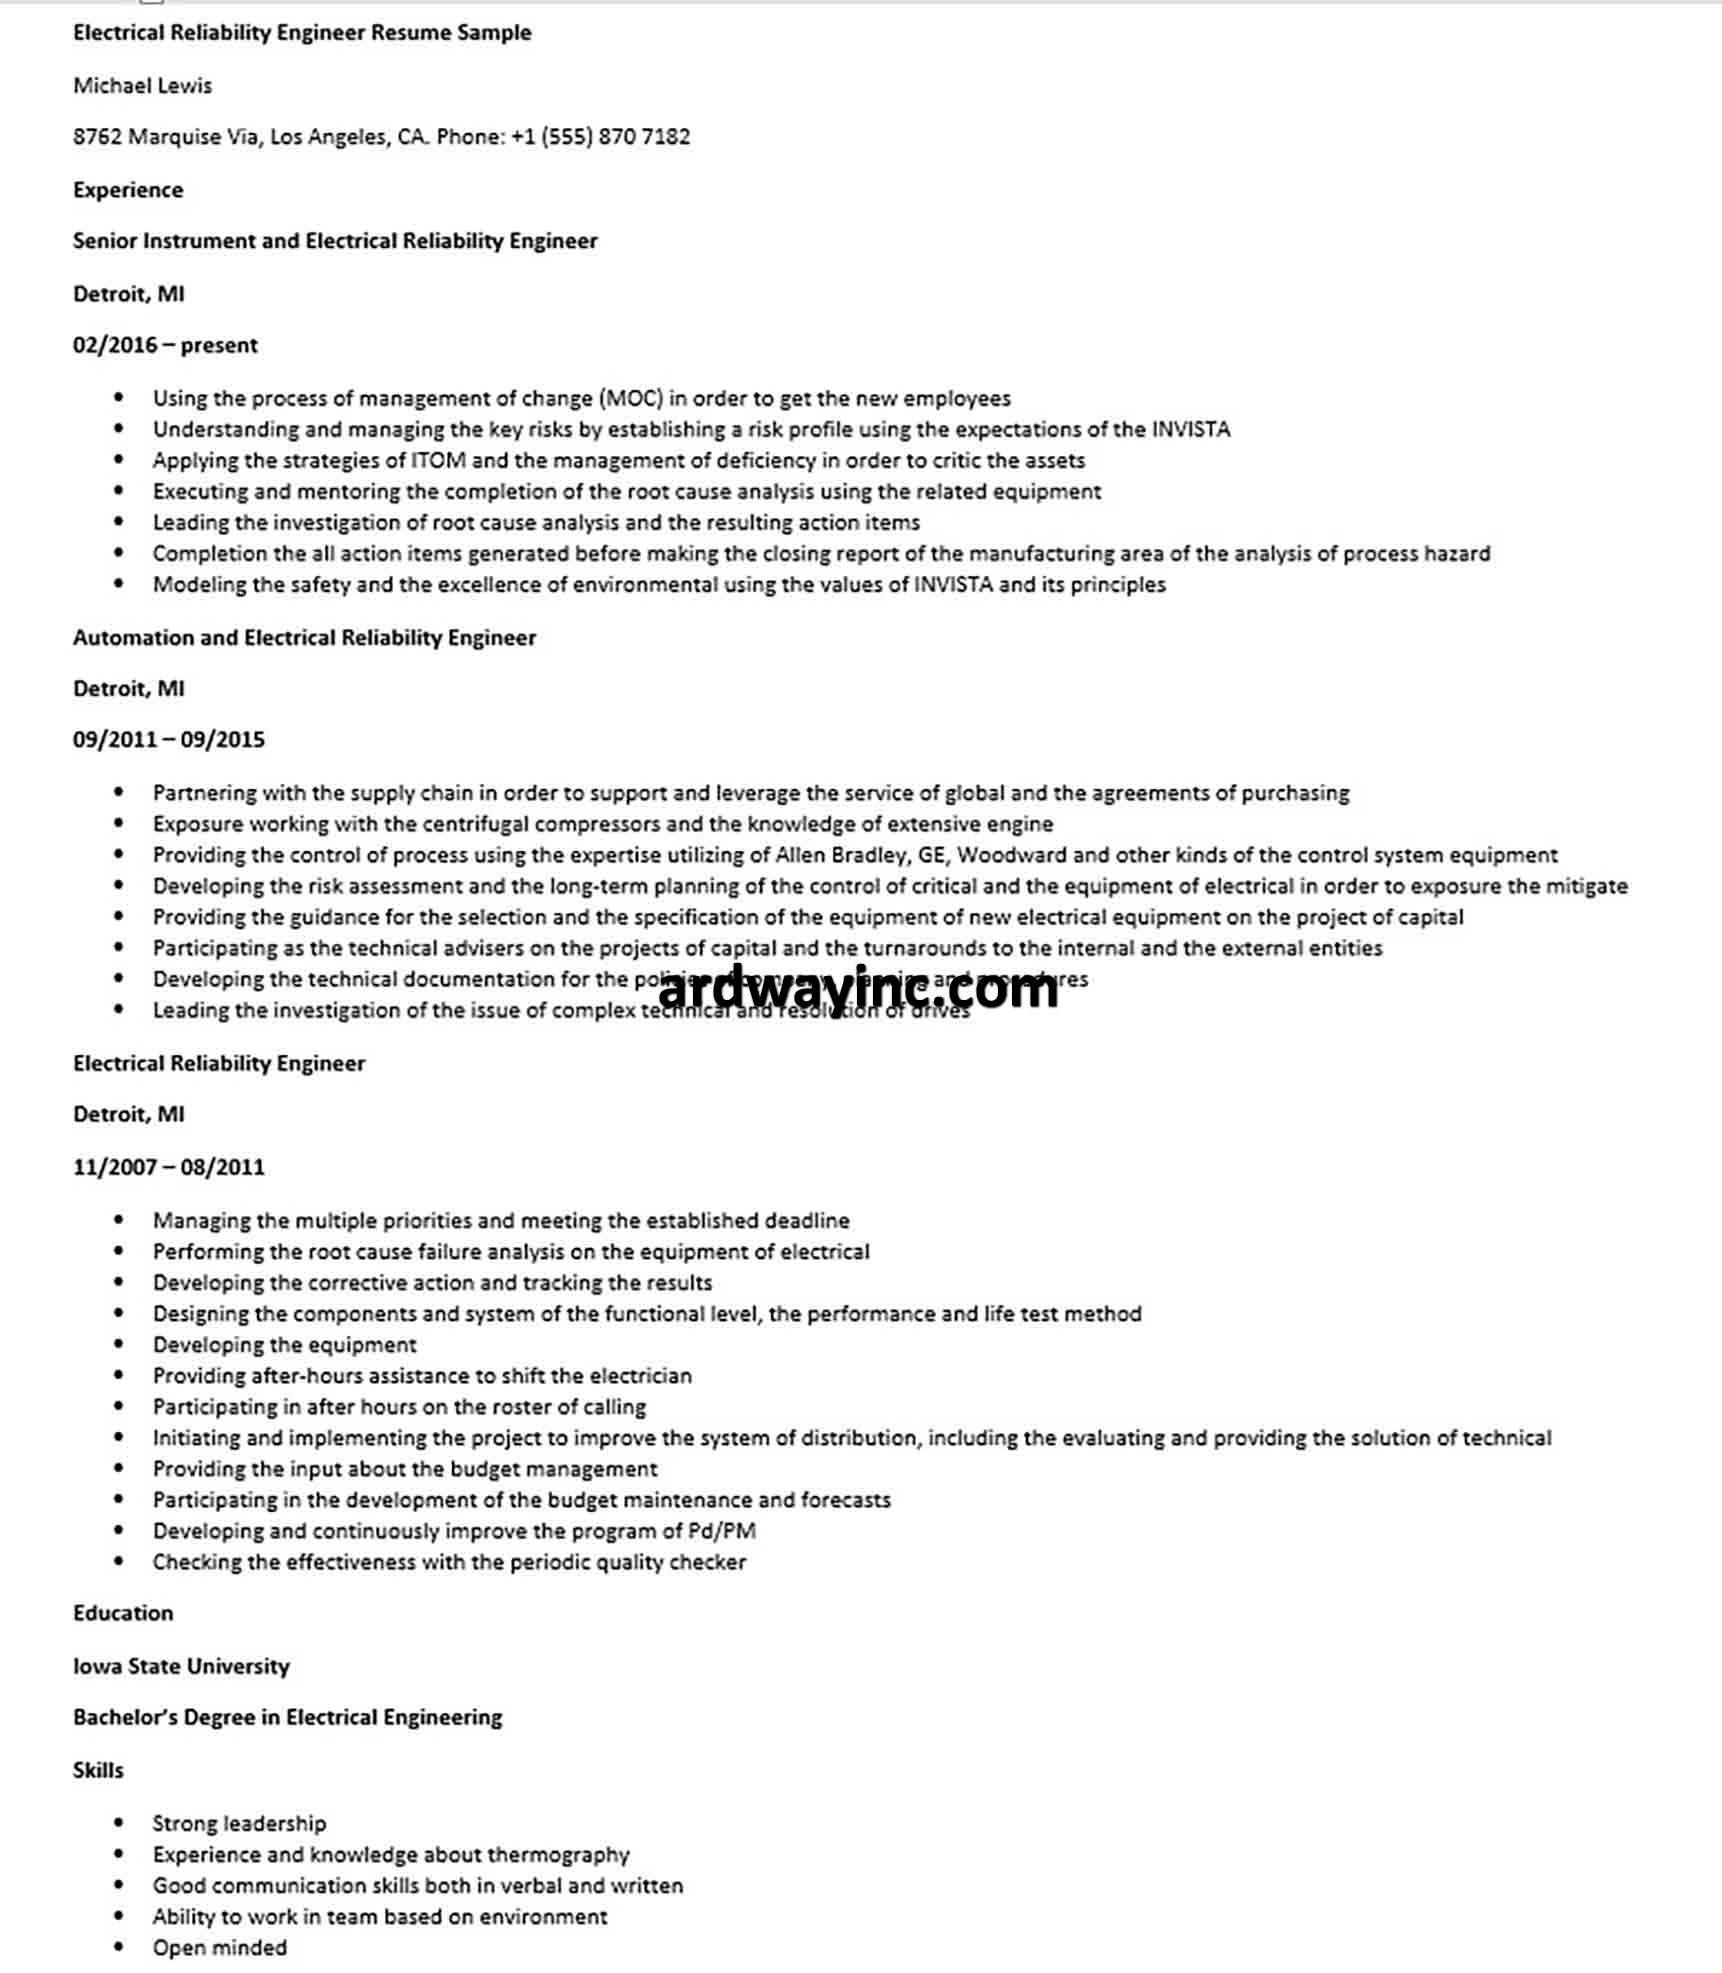 Electrical Reliability Engineer Resume Sample Reliability Engineering Good Communication Skills Resume